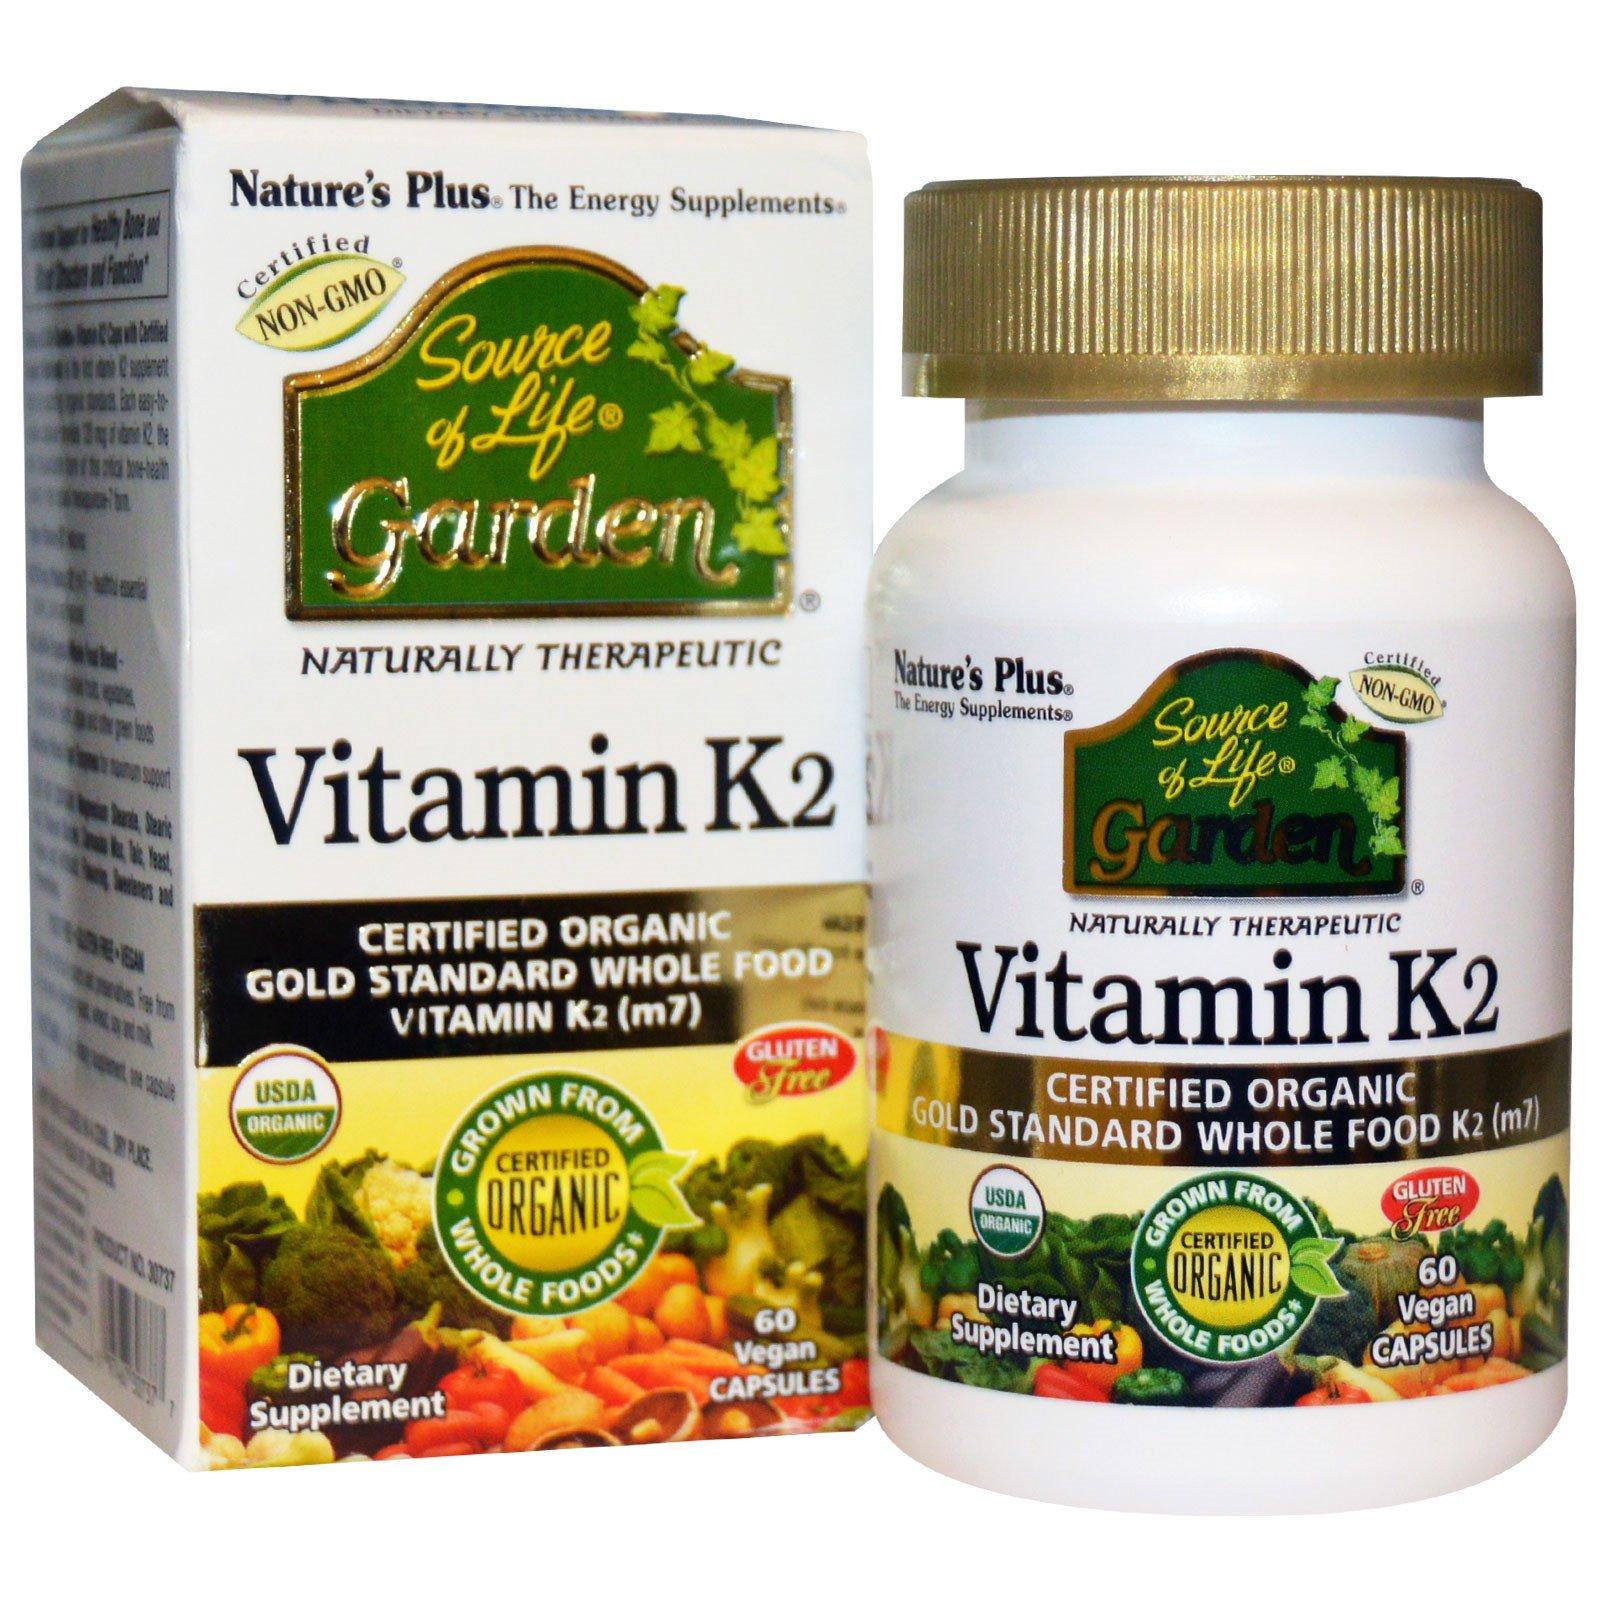 Image of Vitamin K2 (60 Vegan Caps) - Nature's Plus 0097467307377